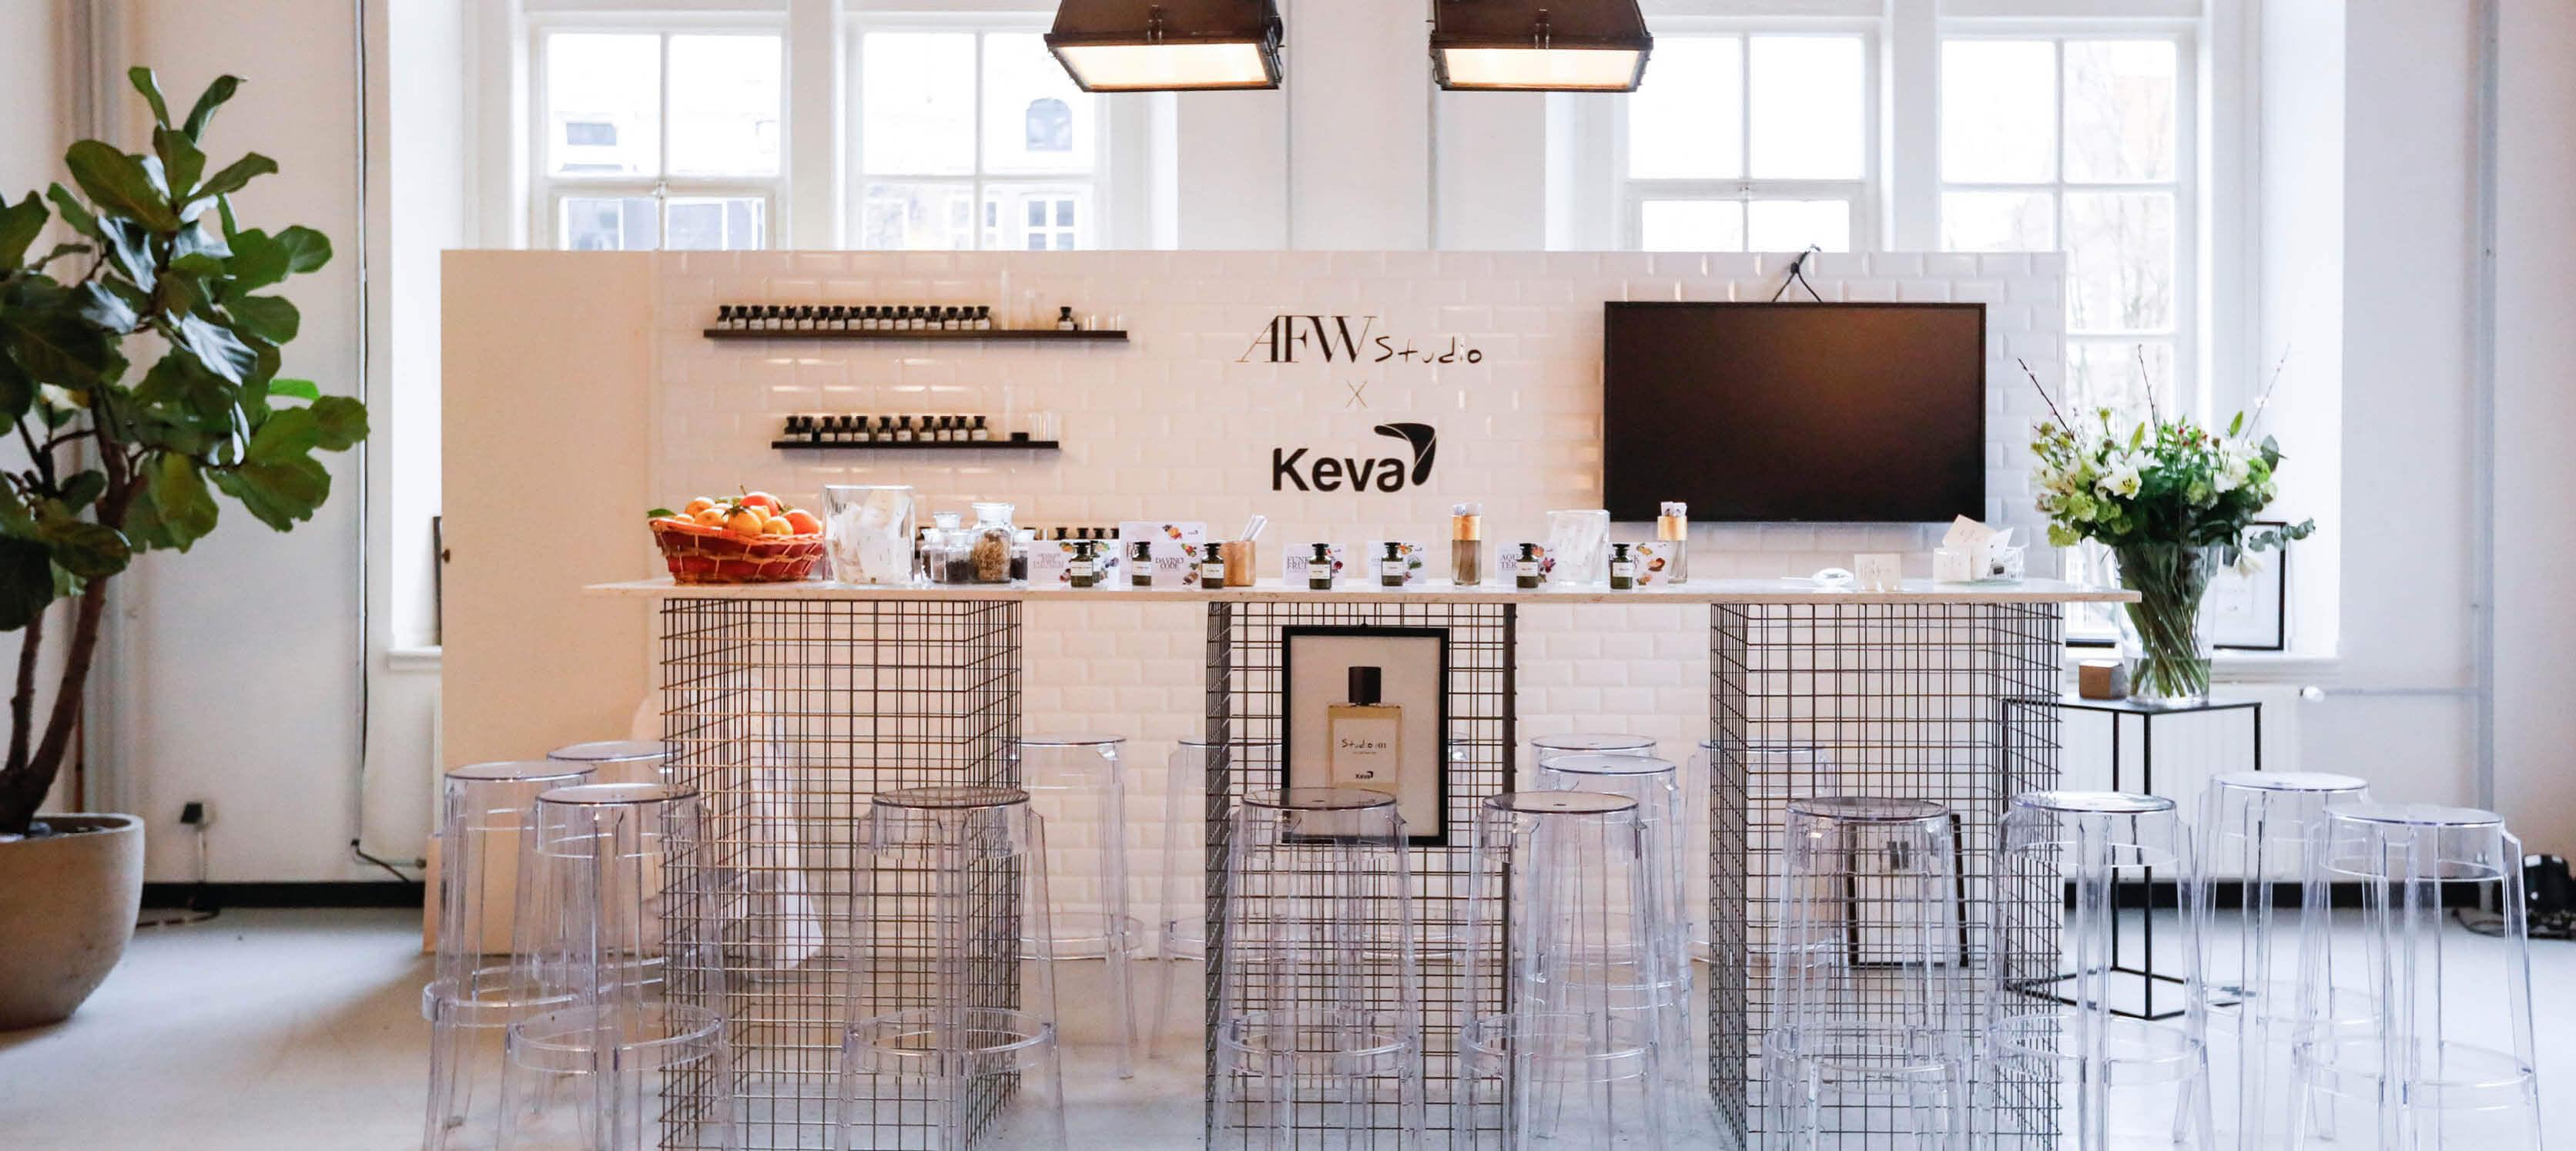 AFW en Keva Presenteren COLLAB, de Nieuwe AFW Parfum